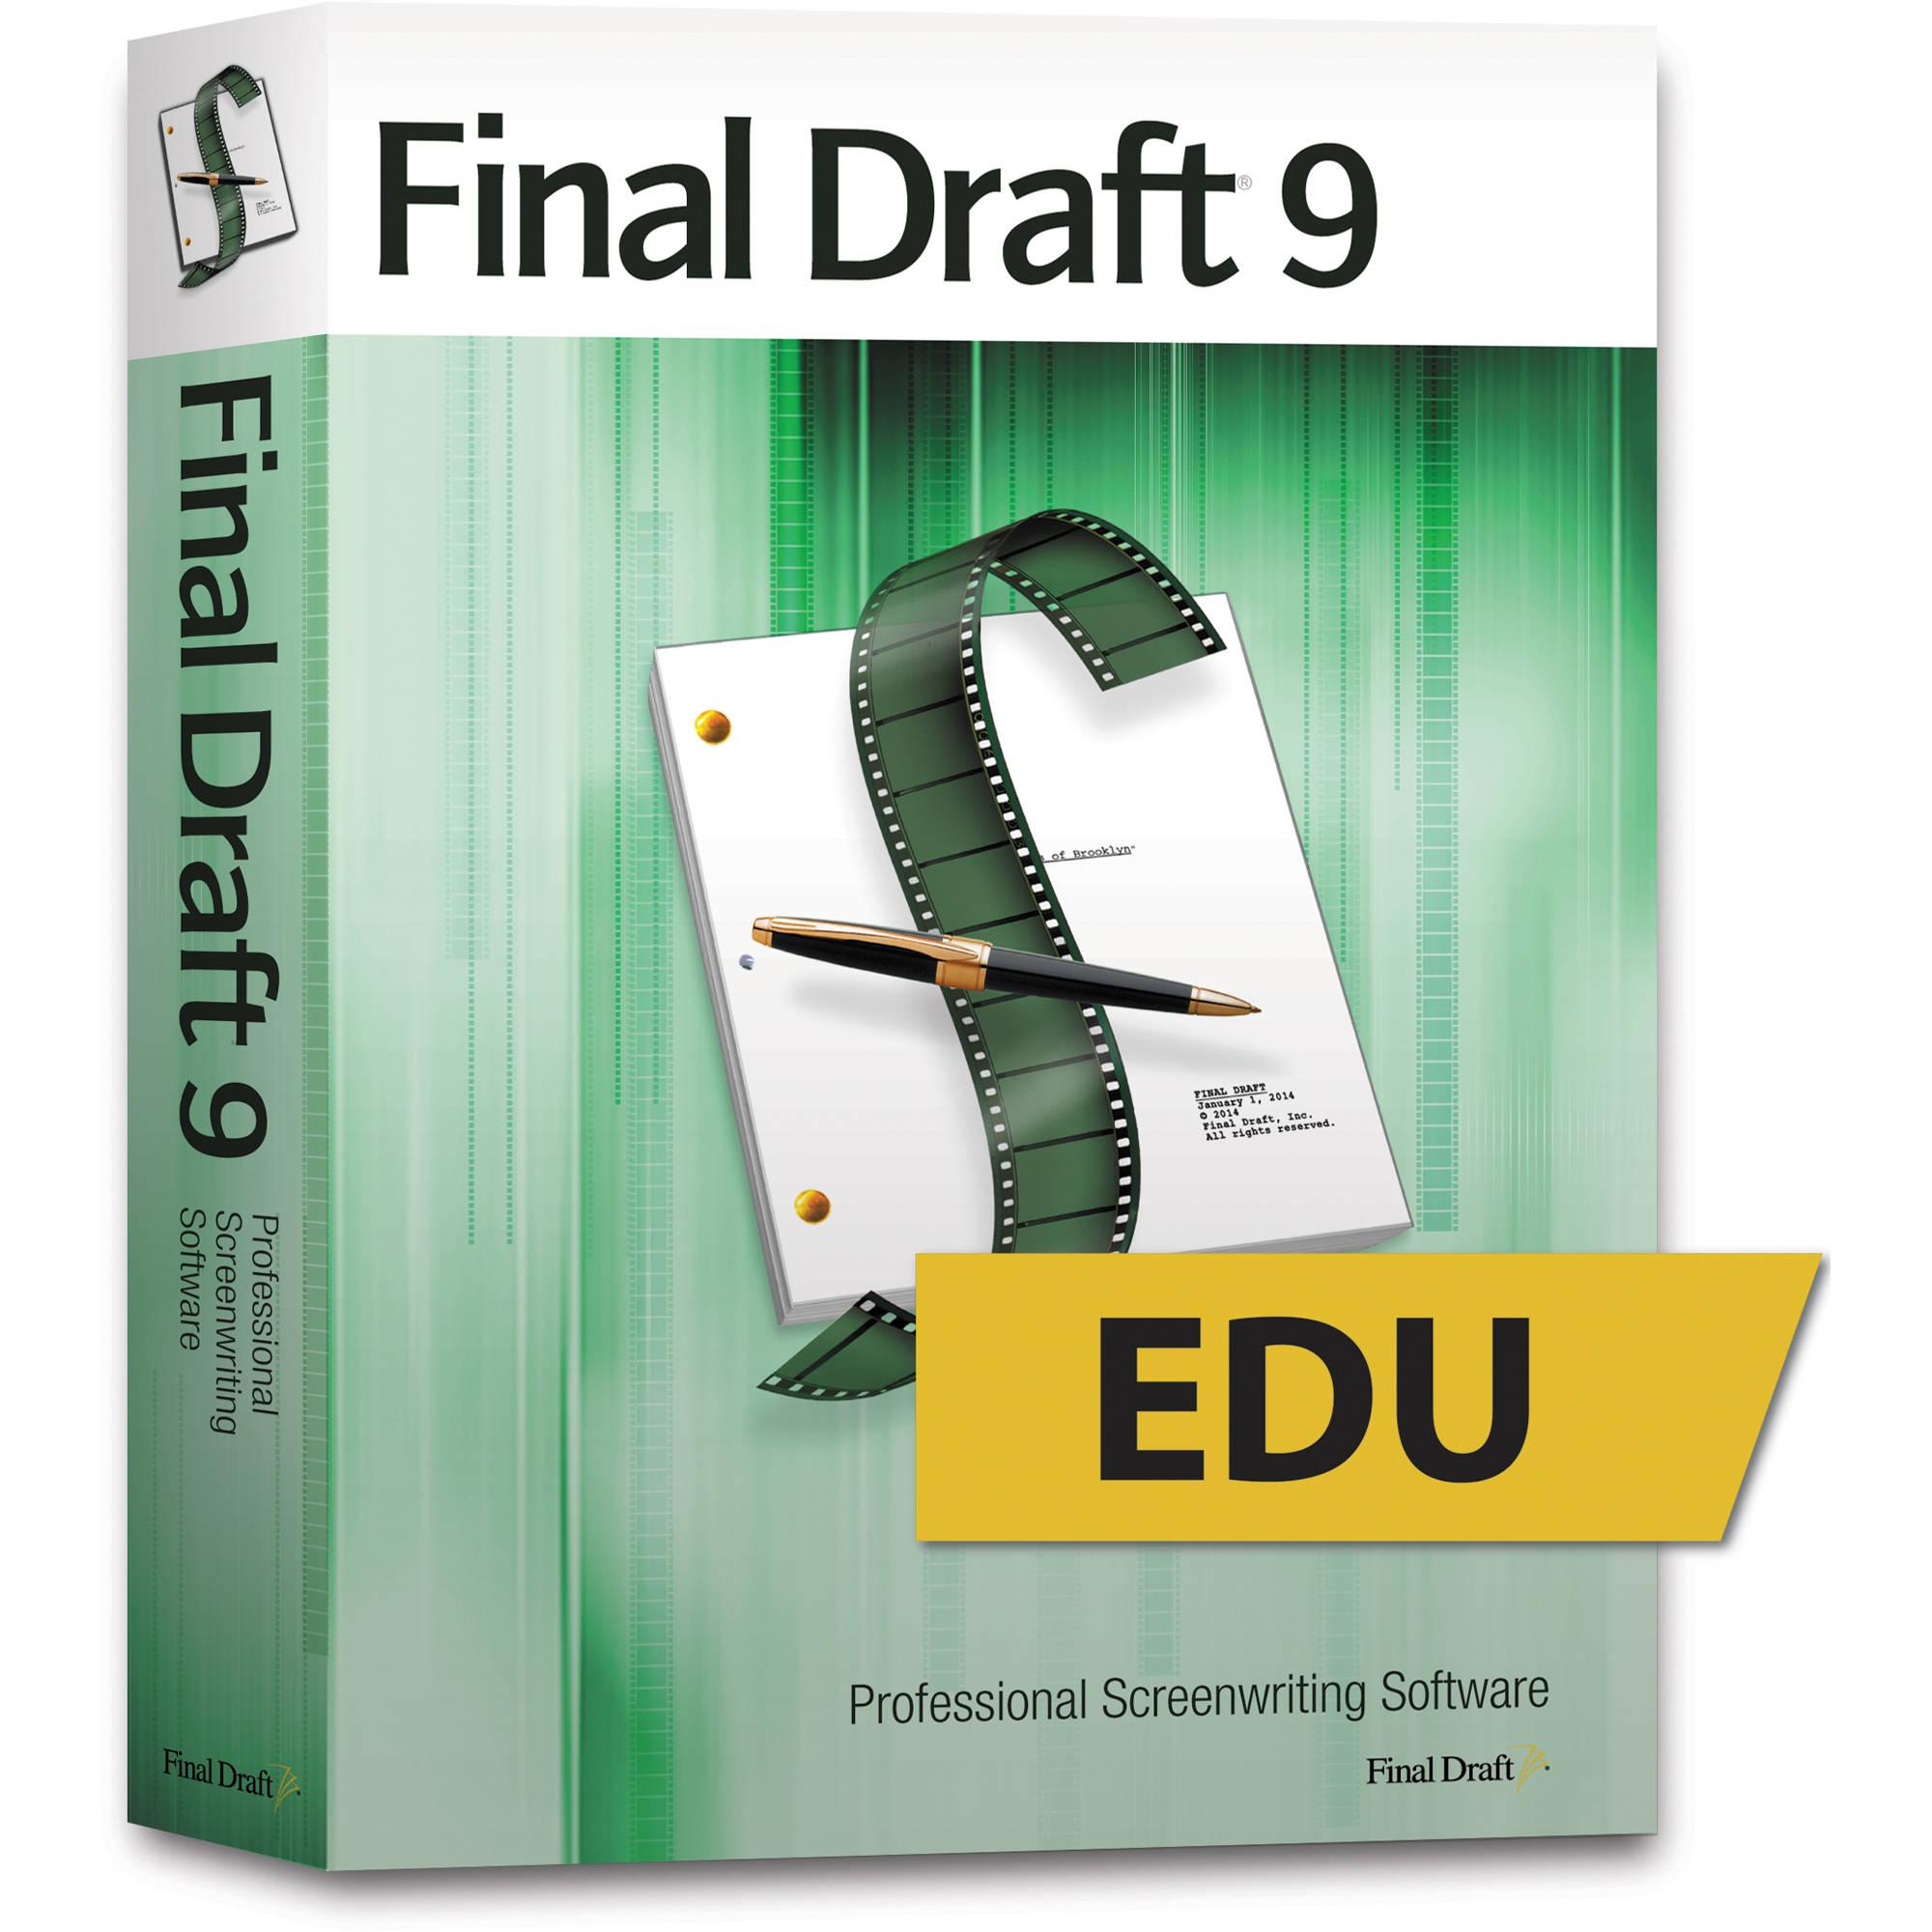 Final Draft 9 Educational Screenwriting Software (DVD)